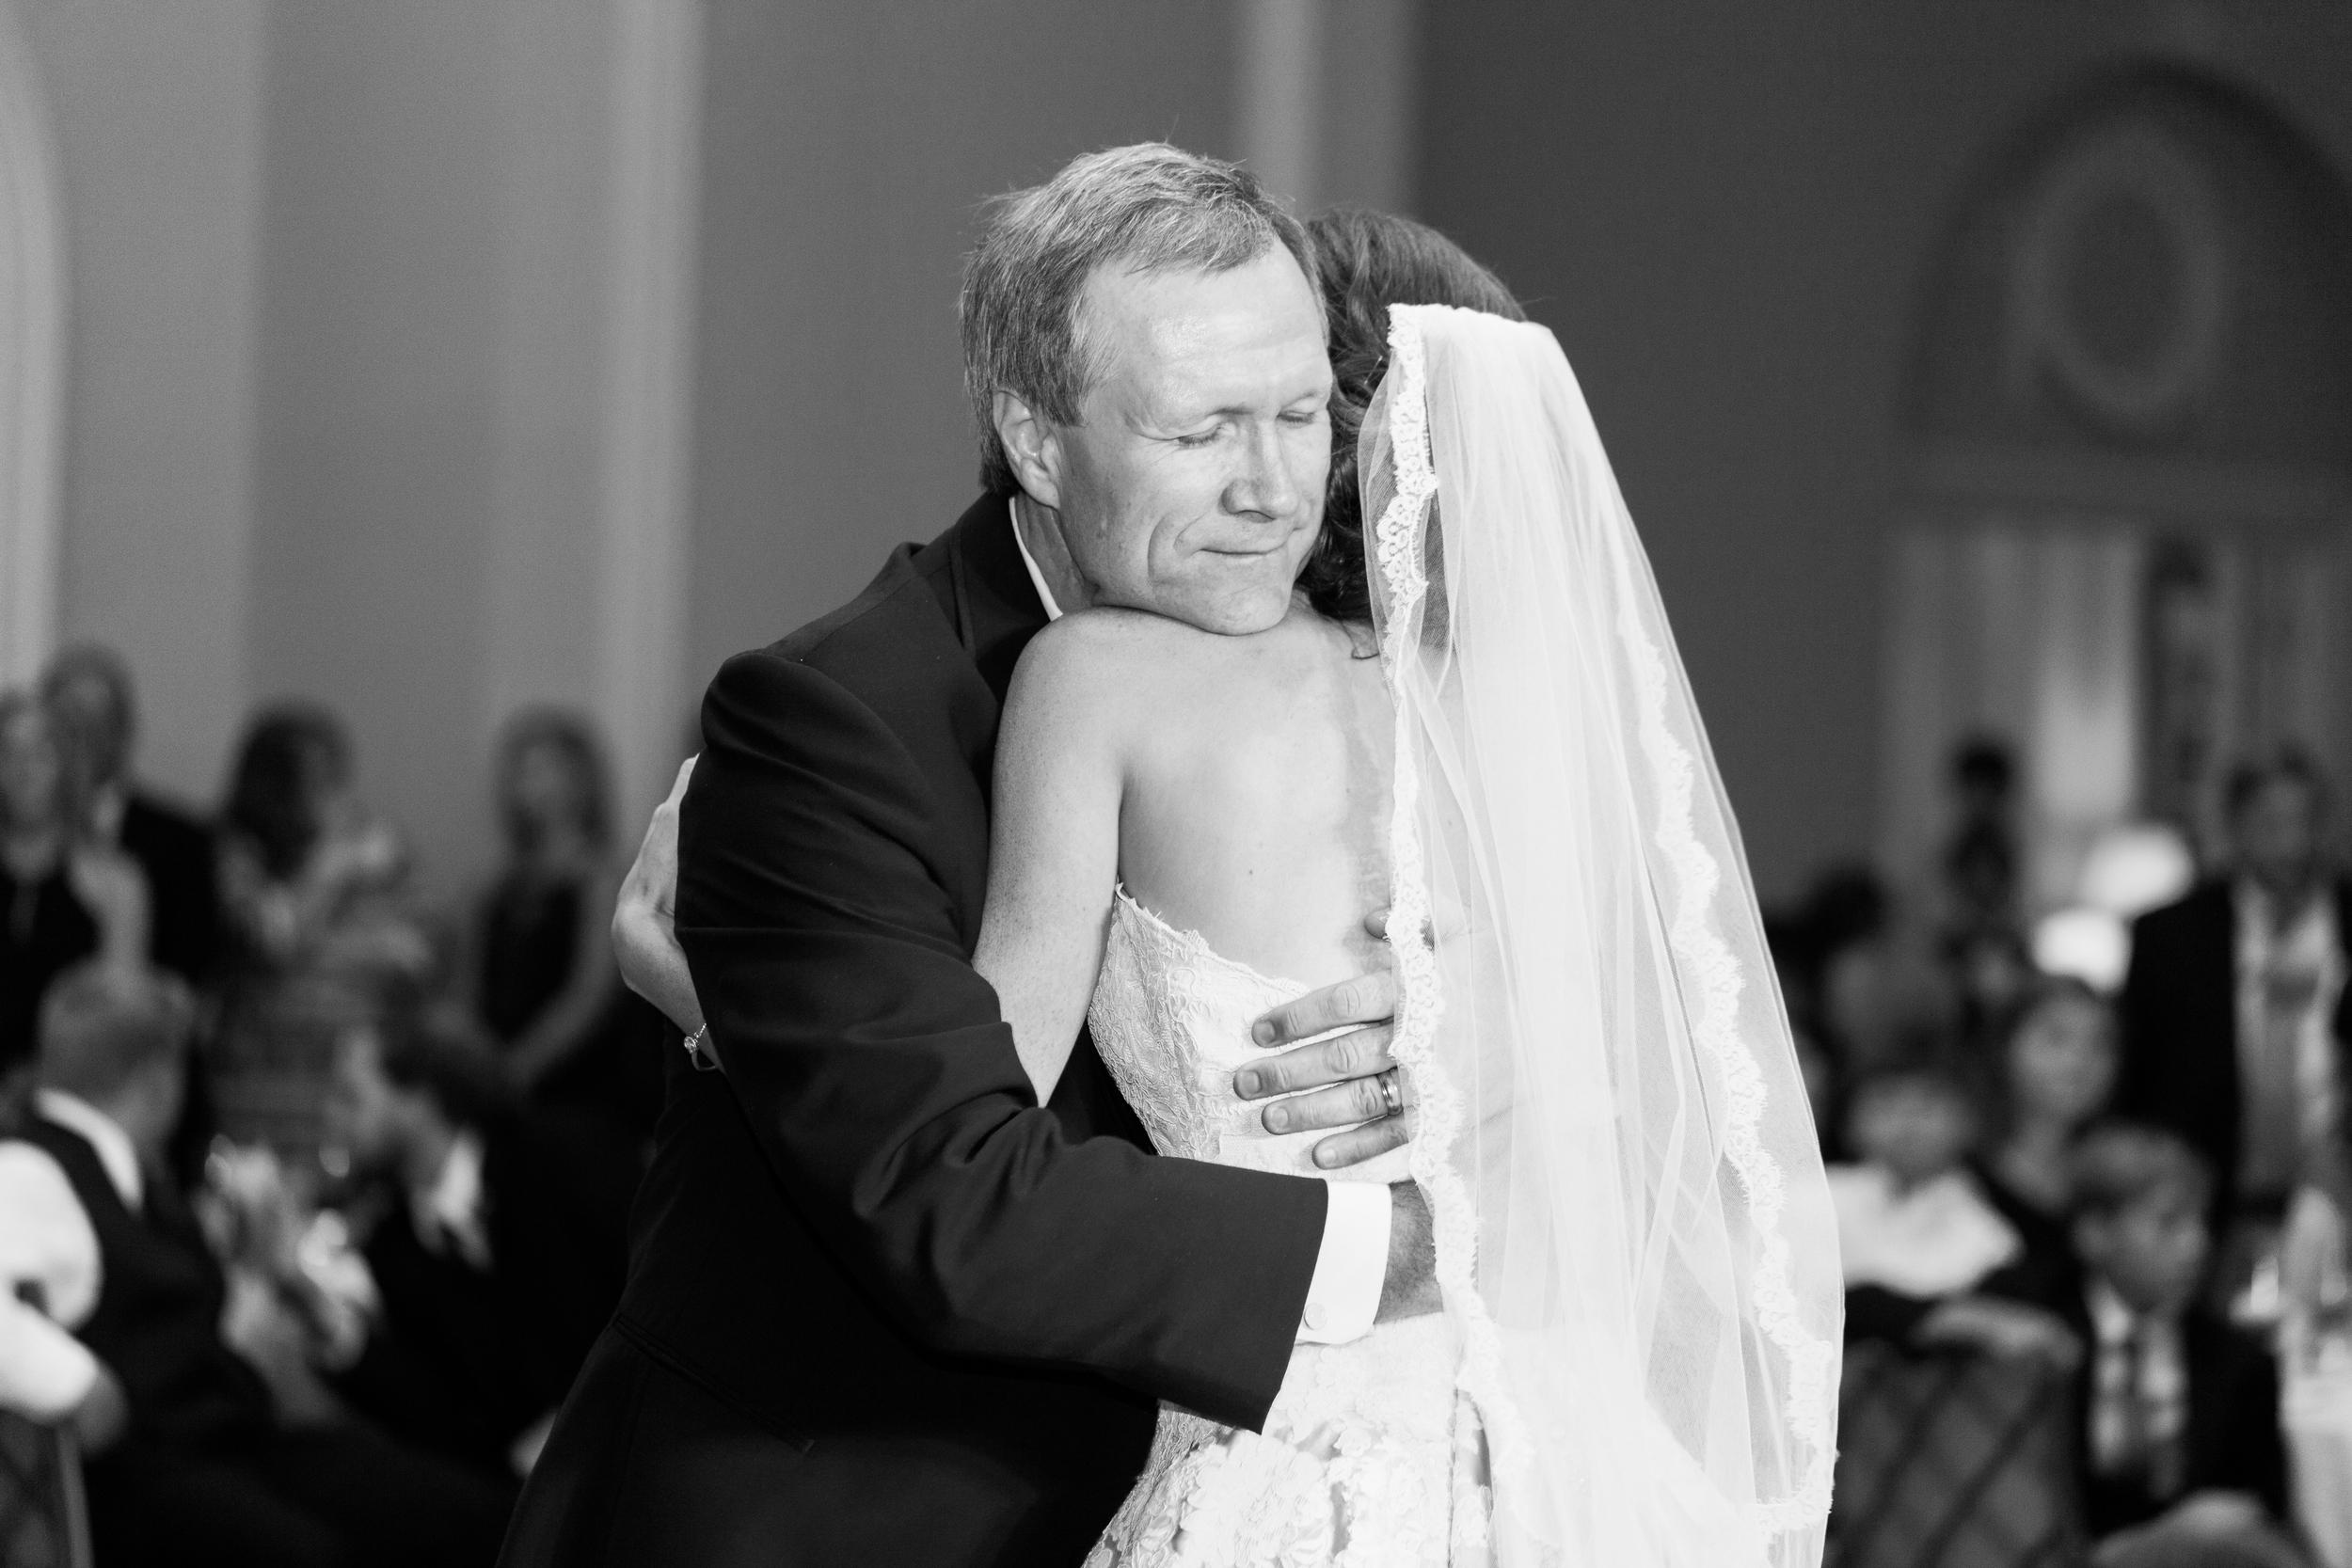 Brewbaker-Wedding-Montgomery-Alabama-Nick-Drollette-137.jpg